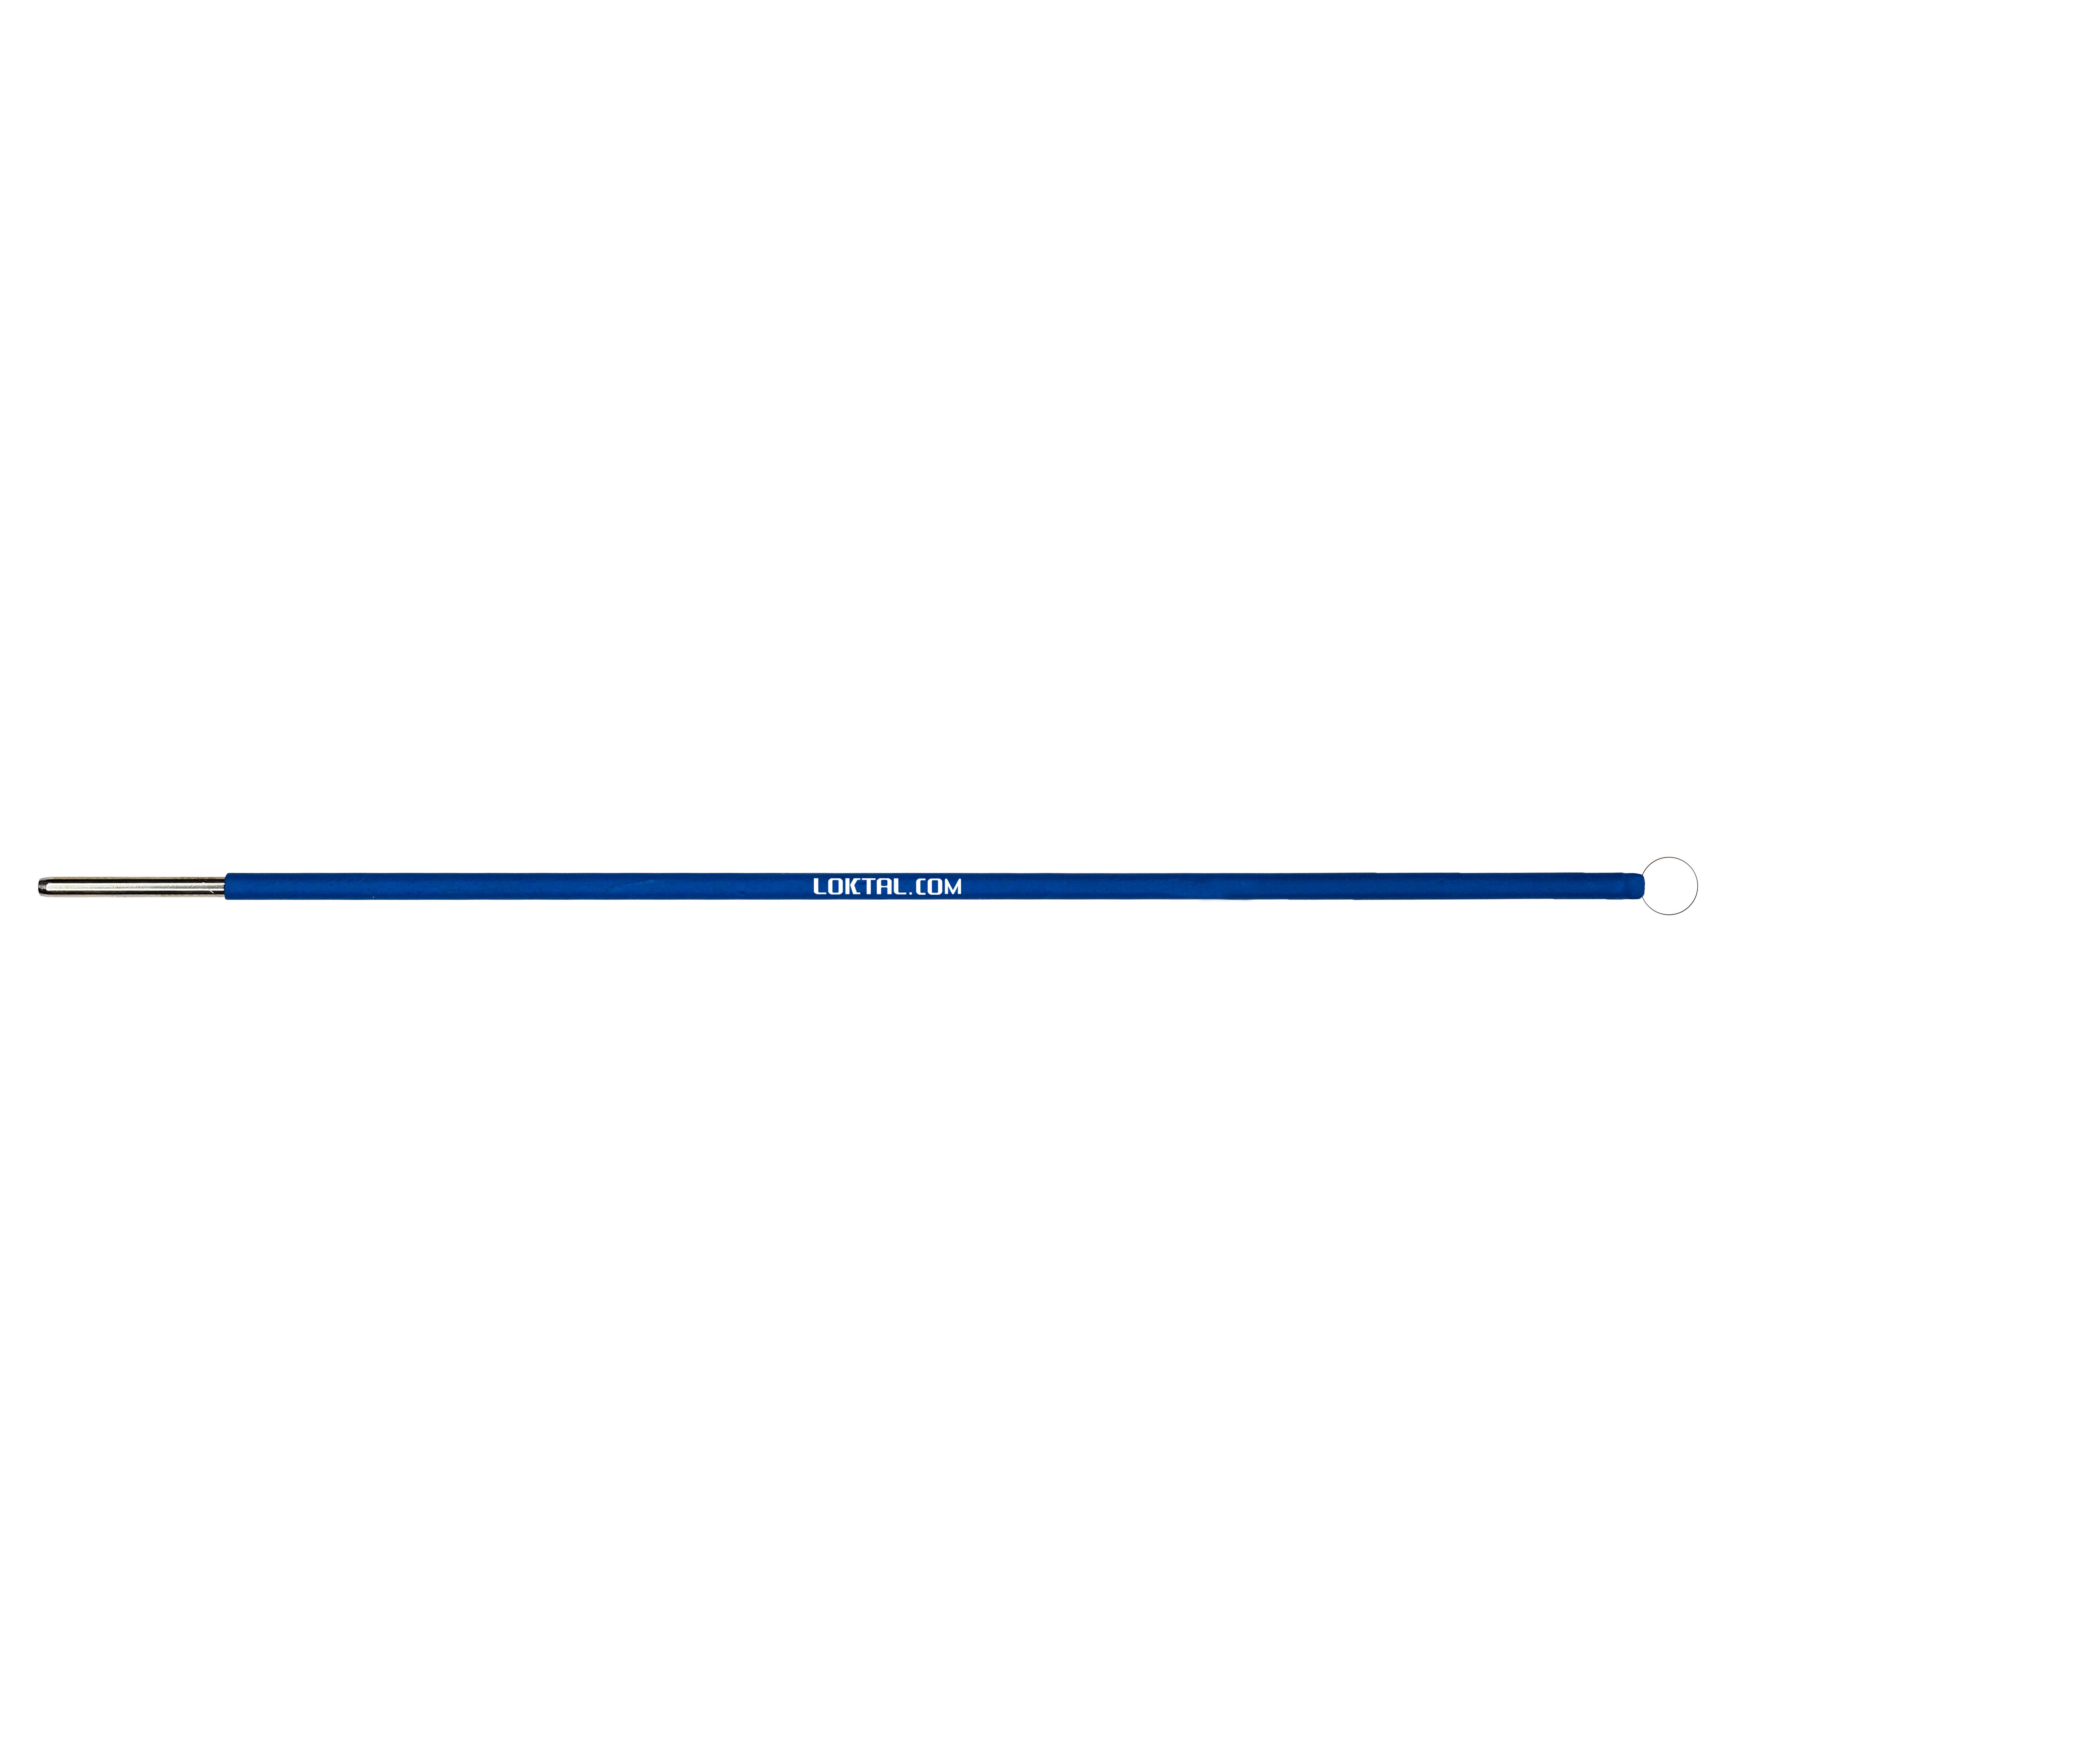 ACEL0026 - Eletrodo Eletrocirúrgico Alça, Reto